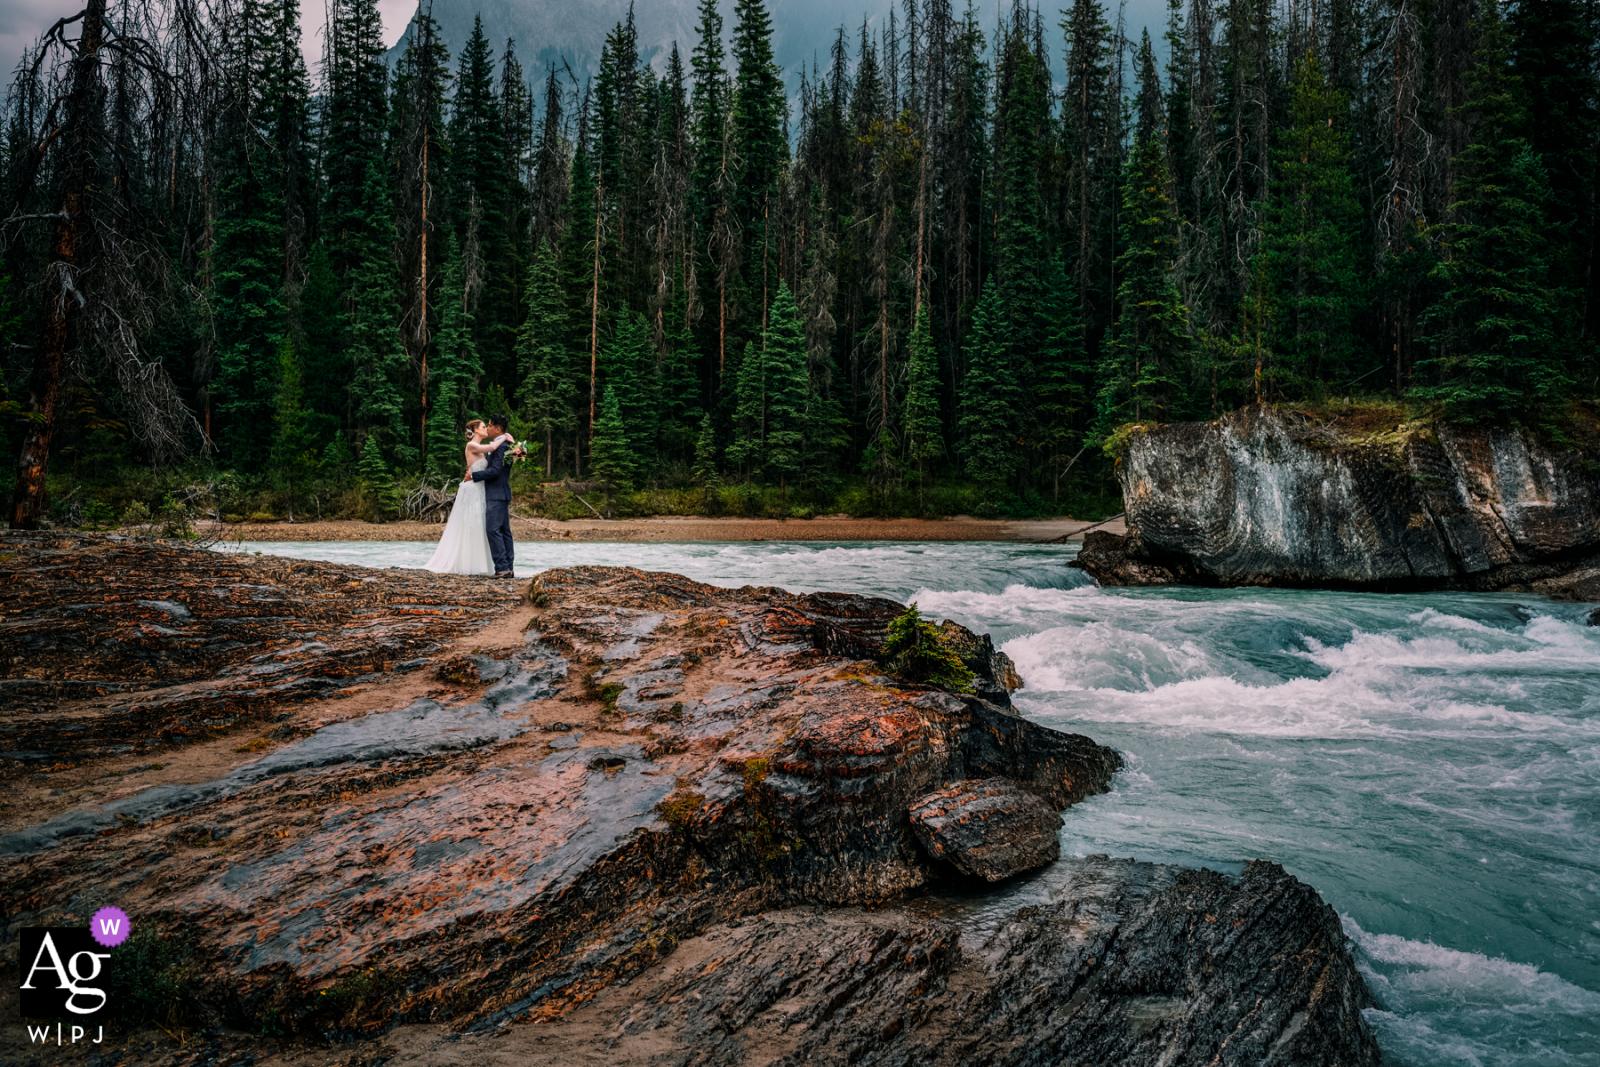 Natural Bridge, Field, BC, Canada fine art wedding couple portrait with a sweet Romantic kiss